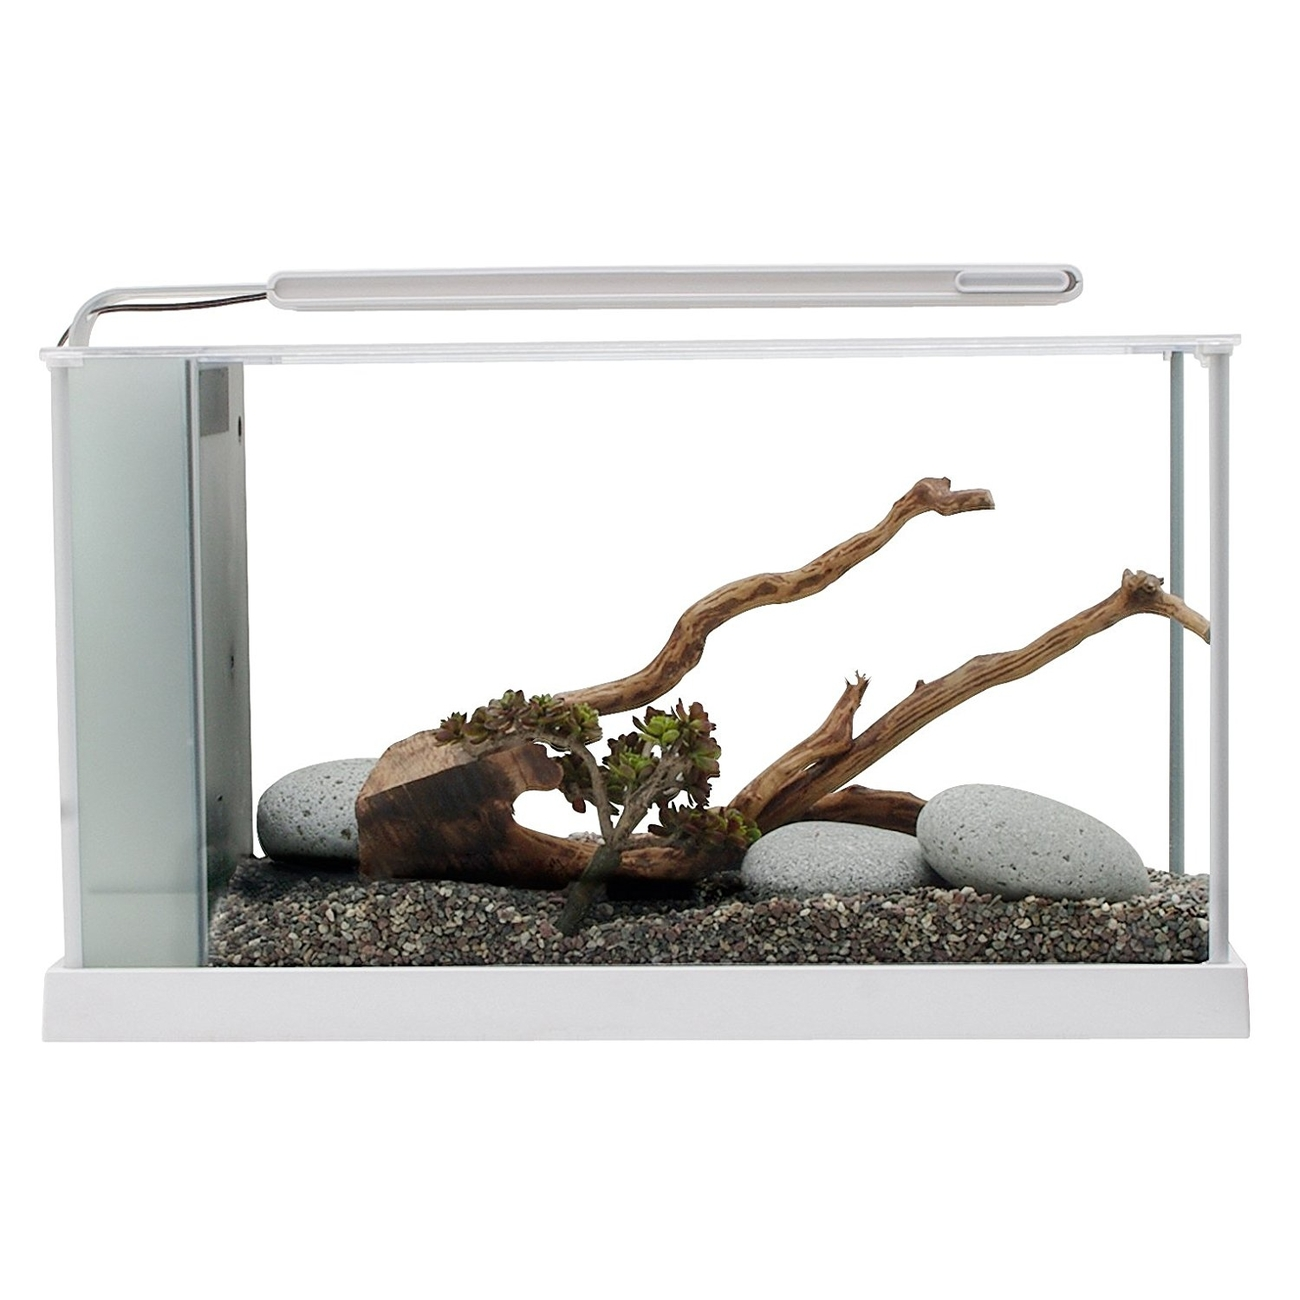 Hagen Fluval SPEC Süßwasser Aquarium Set, SPEC 5 - 21,1 l weiß (51,5 x 30,5 x 19,0 cm)